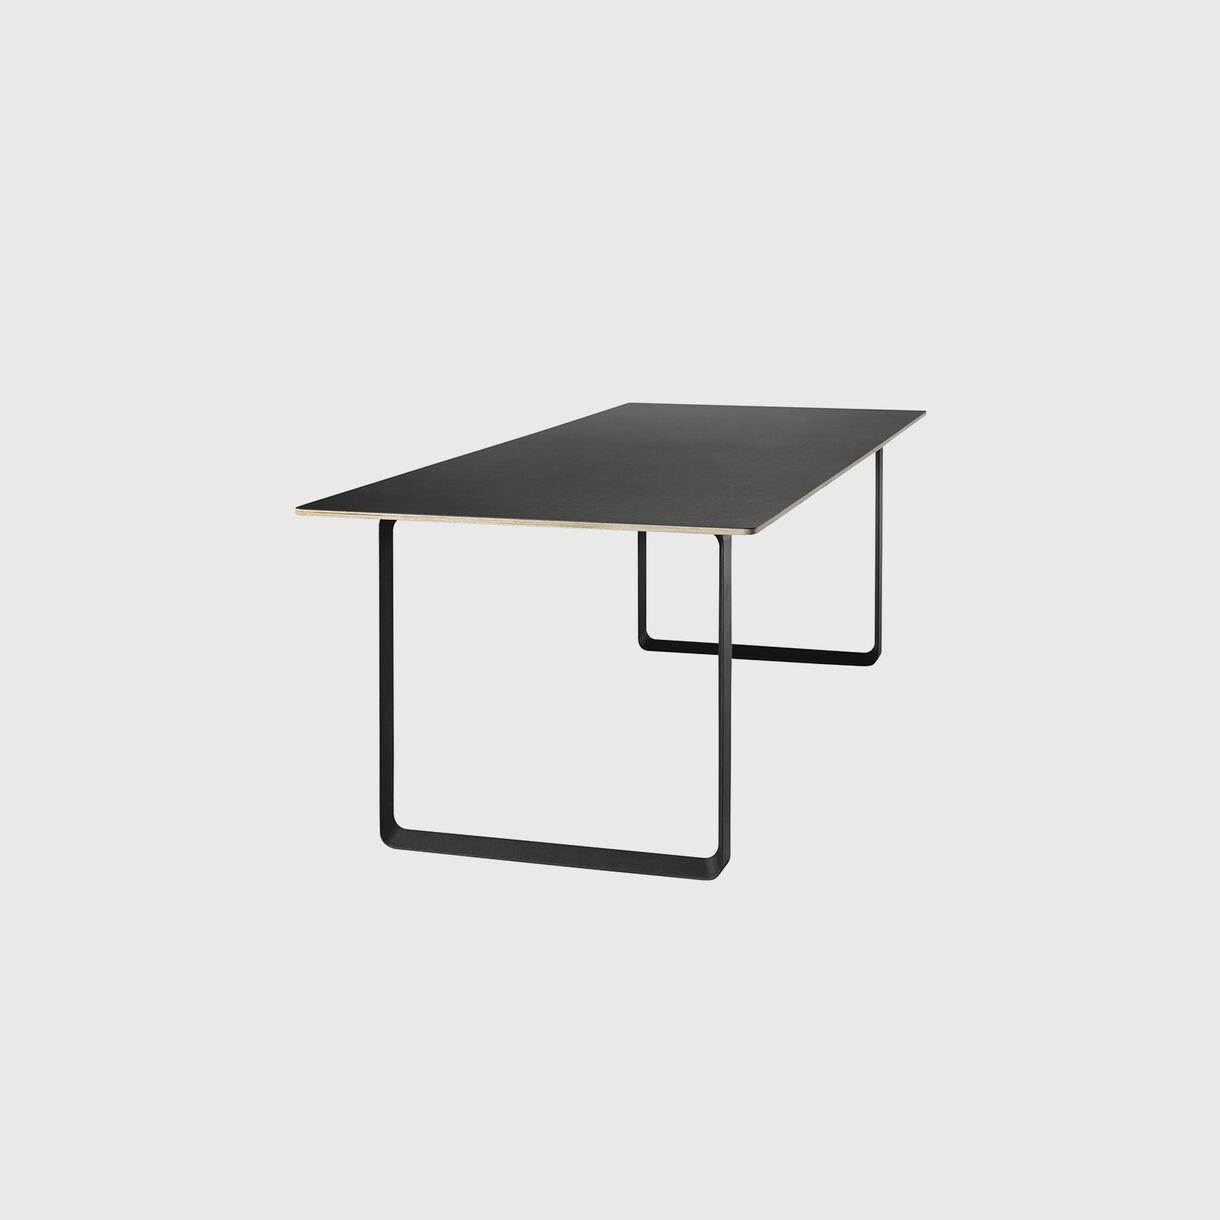 70/70 Table, 1700 x 870, Black